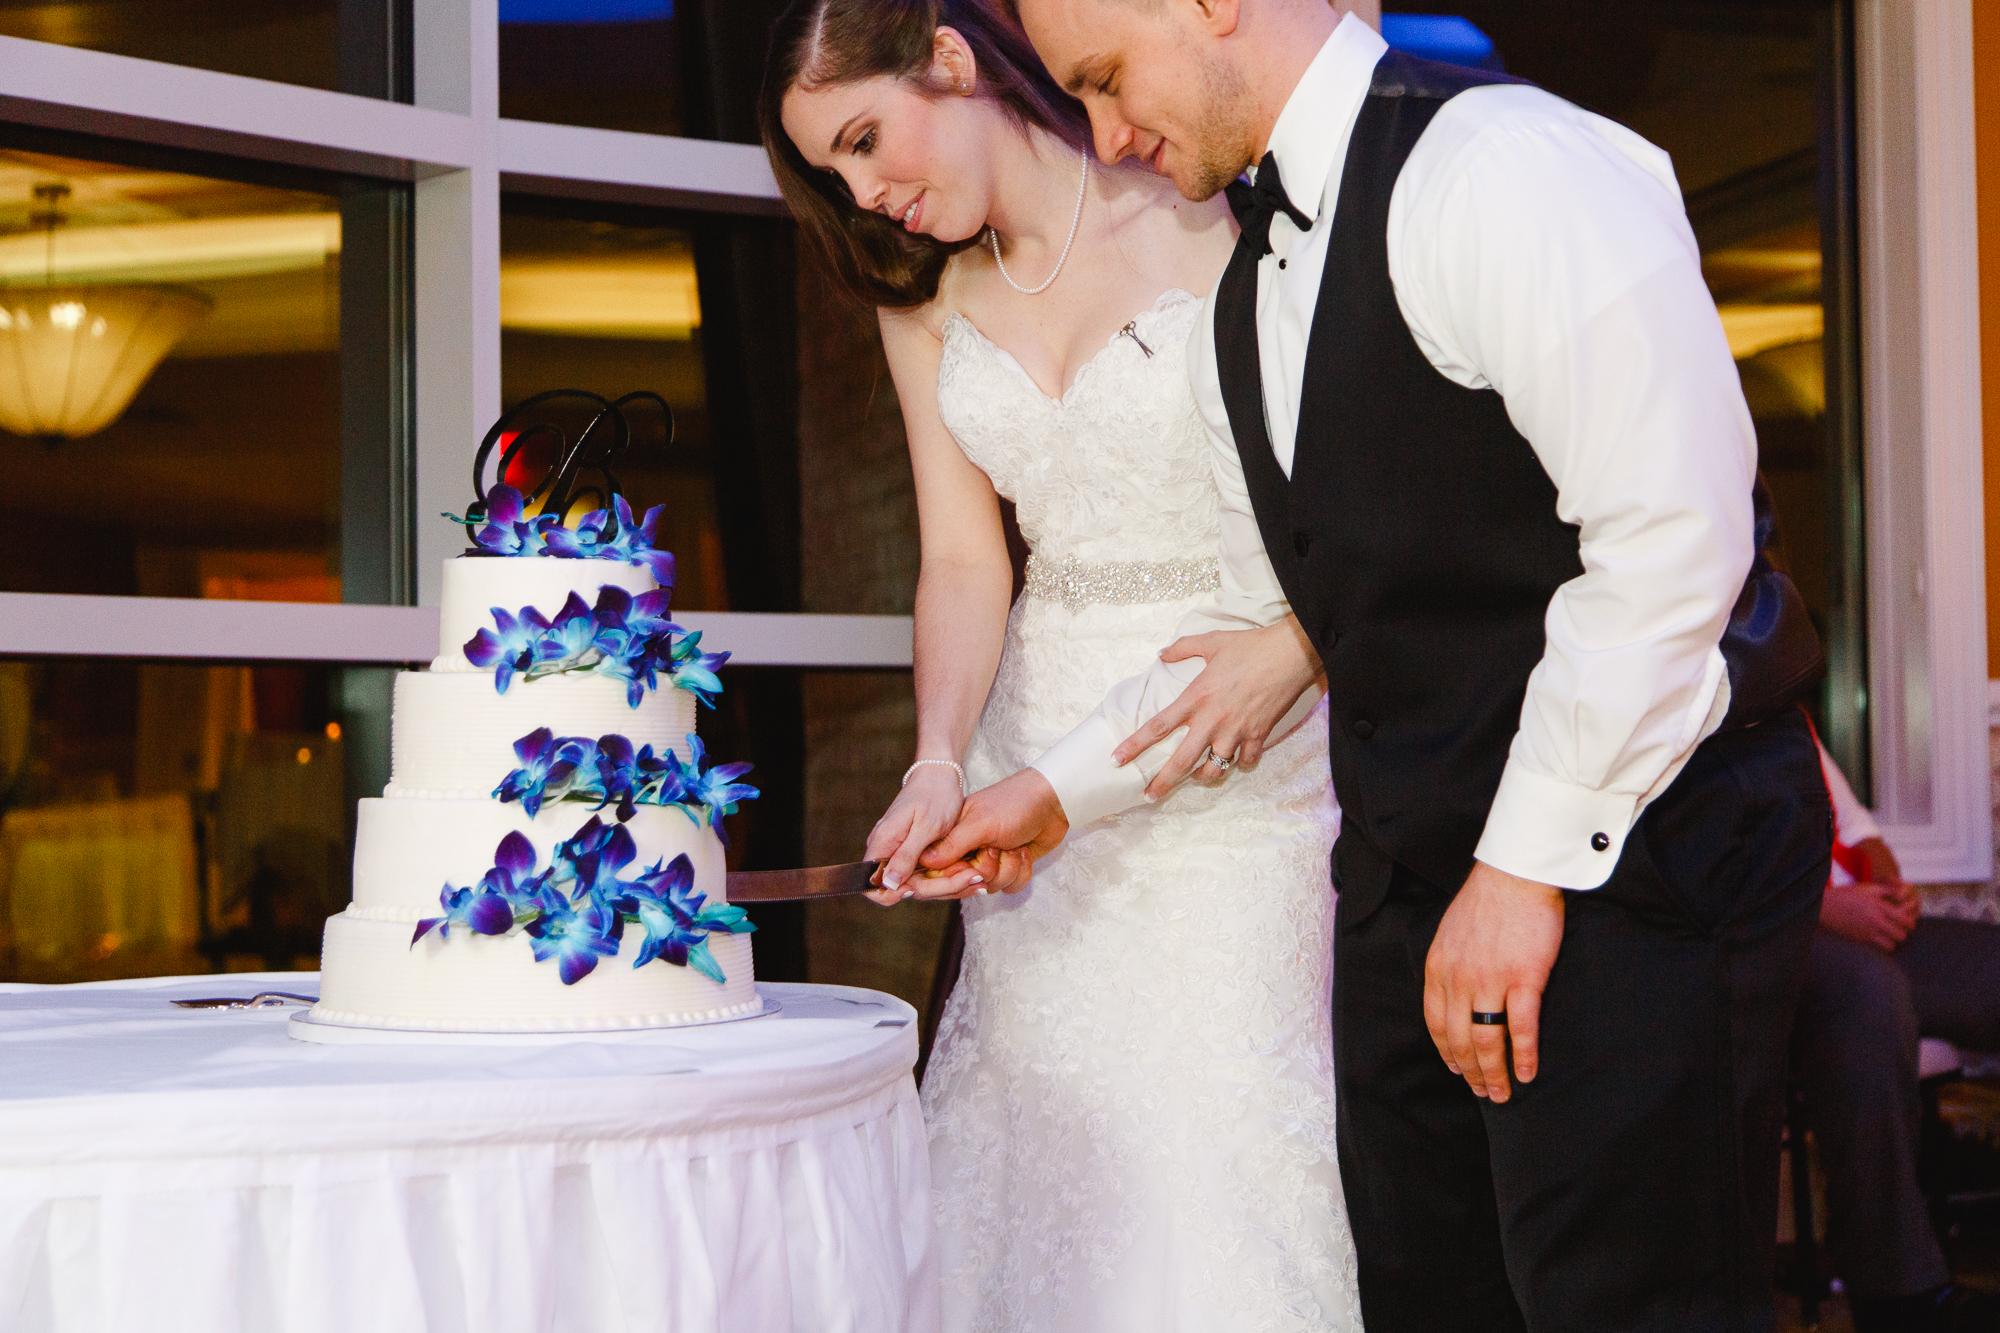 brady-gahanna-ohio-cake-cut-speeches-ceremony-a-ohio-lighting-ocf-columbus-wedding-couple-bridal-creekside-conference-indoor-roxanna-sue-photos-ohio-photography-1.jpg